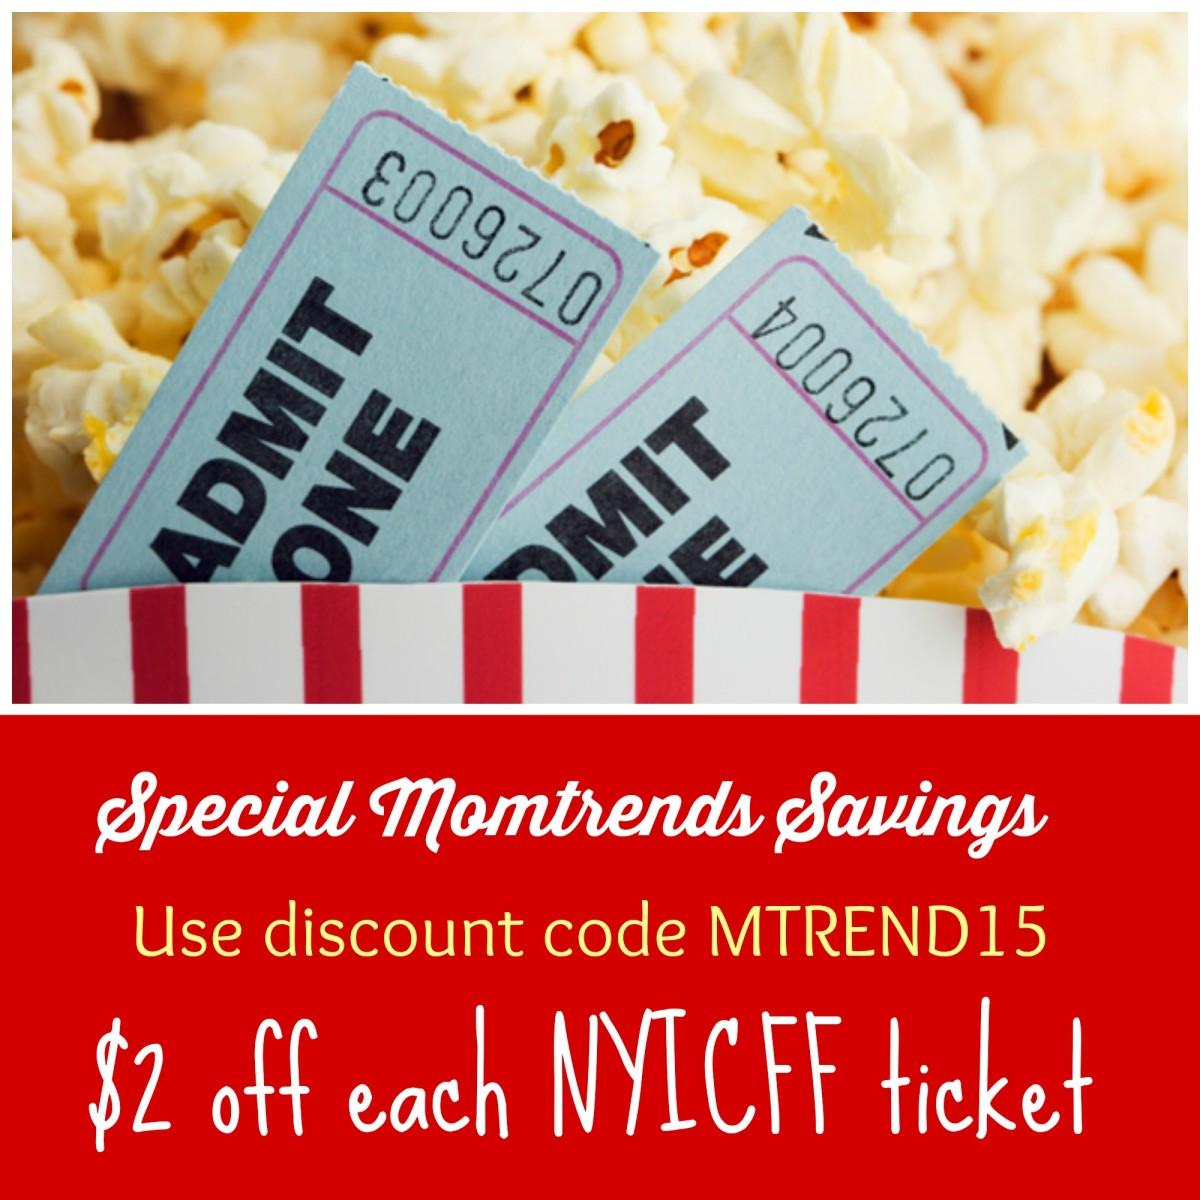 nyicff coupon code